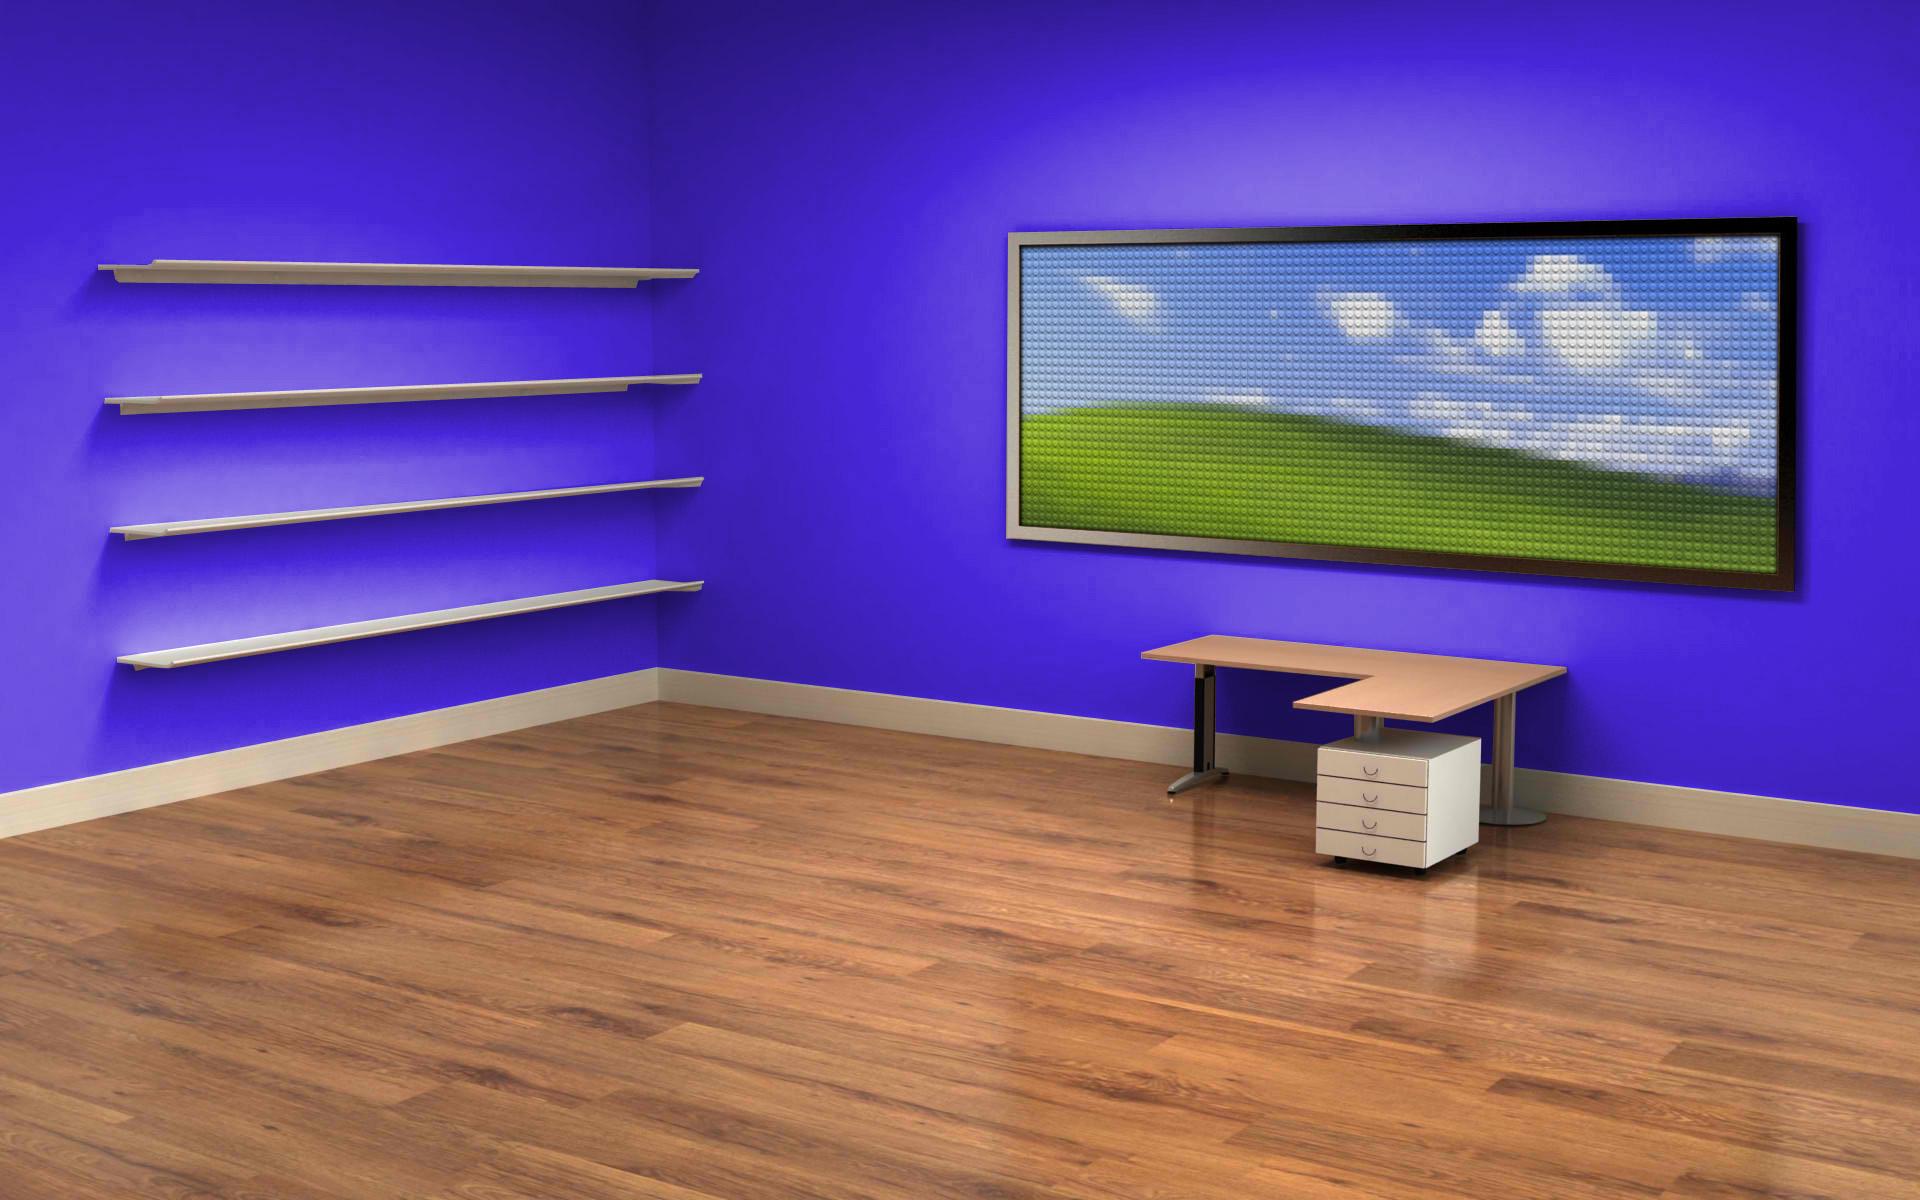 office computer wallpaper,blue,laminate flooring,wood flooring,floor,hardwood